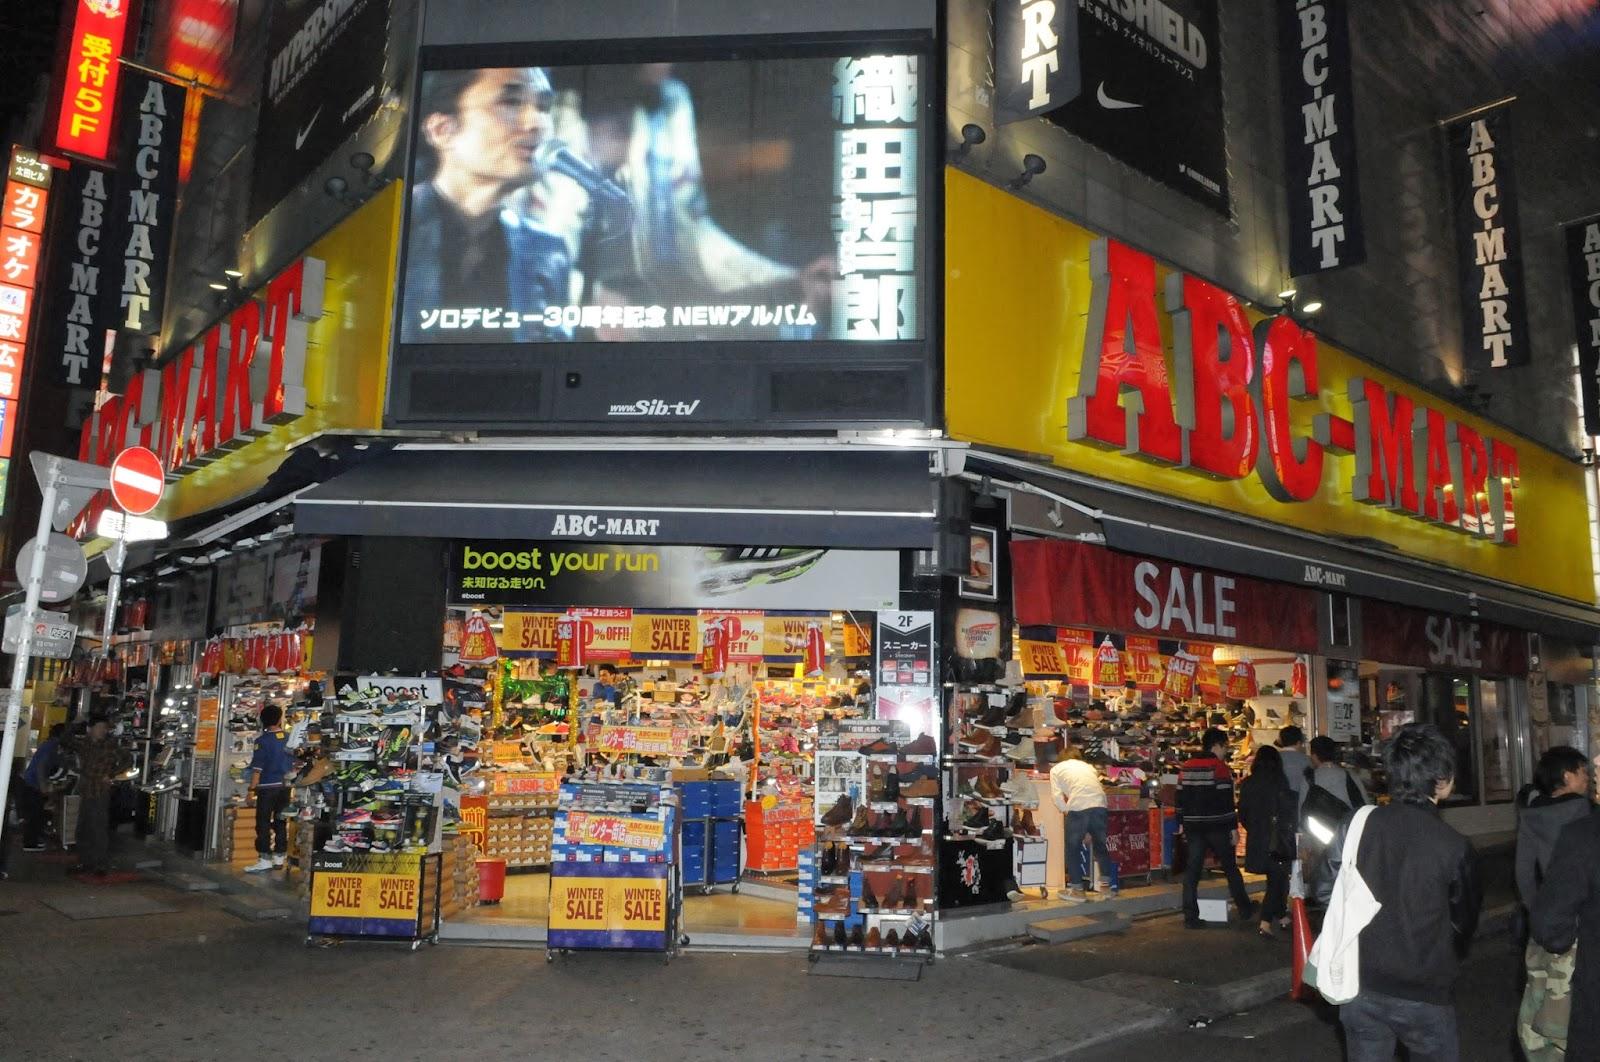 ABC-MART Shoe Store in Shibuya, Tokyo